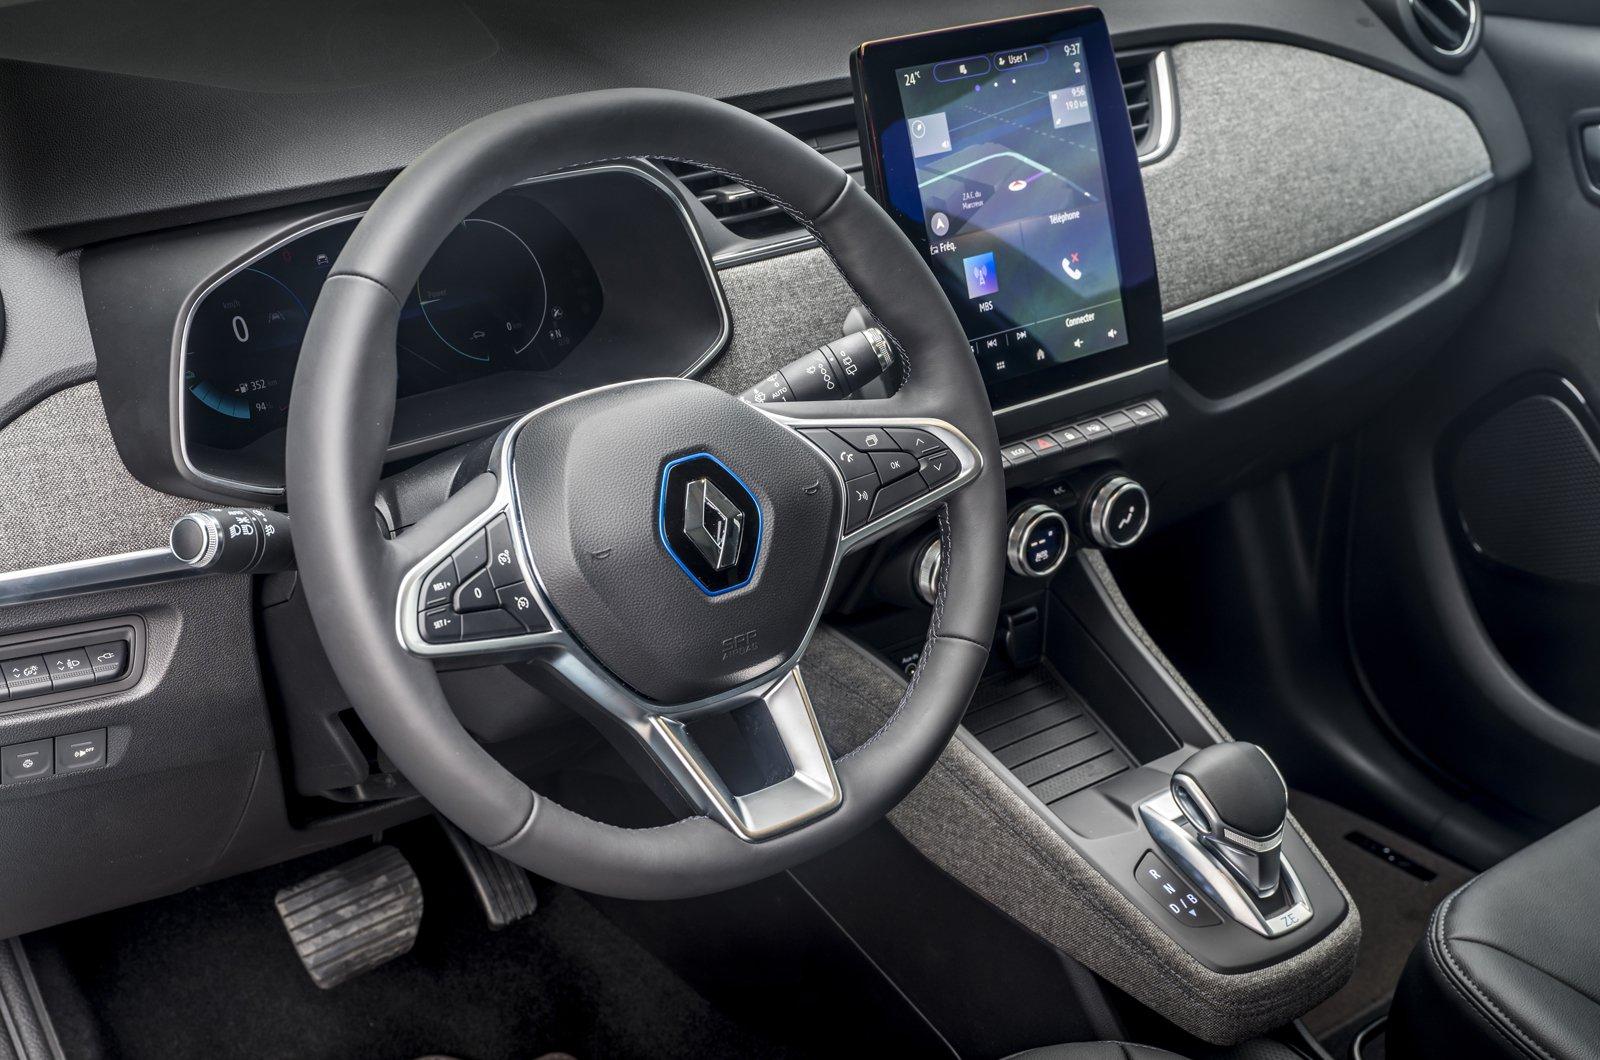 2020 Renault Zoe dashboard